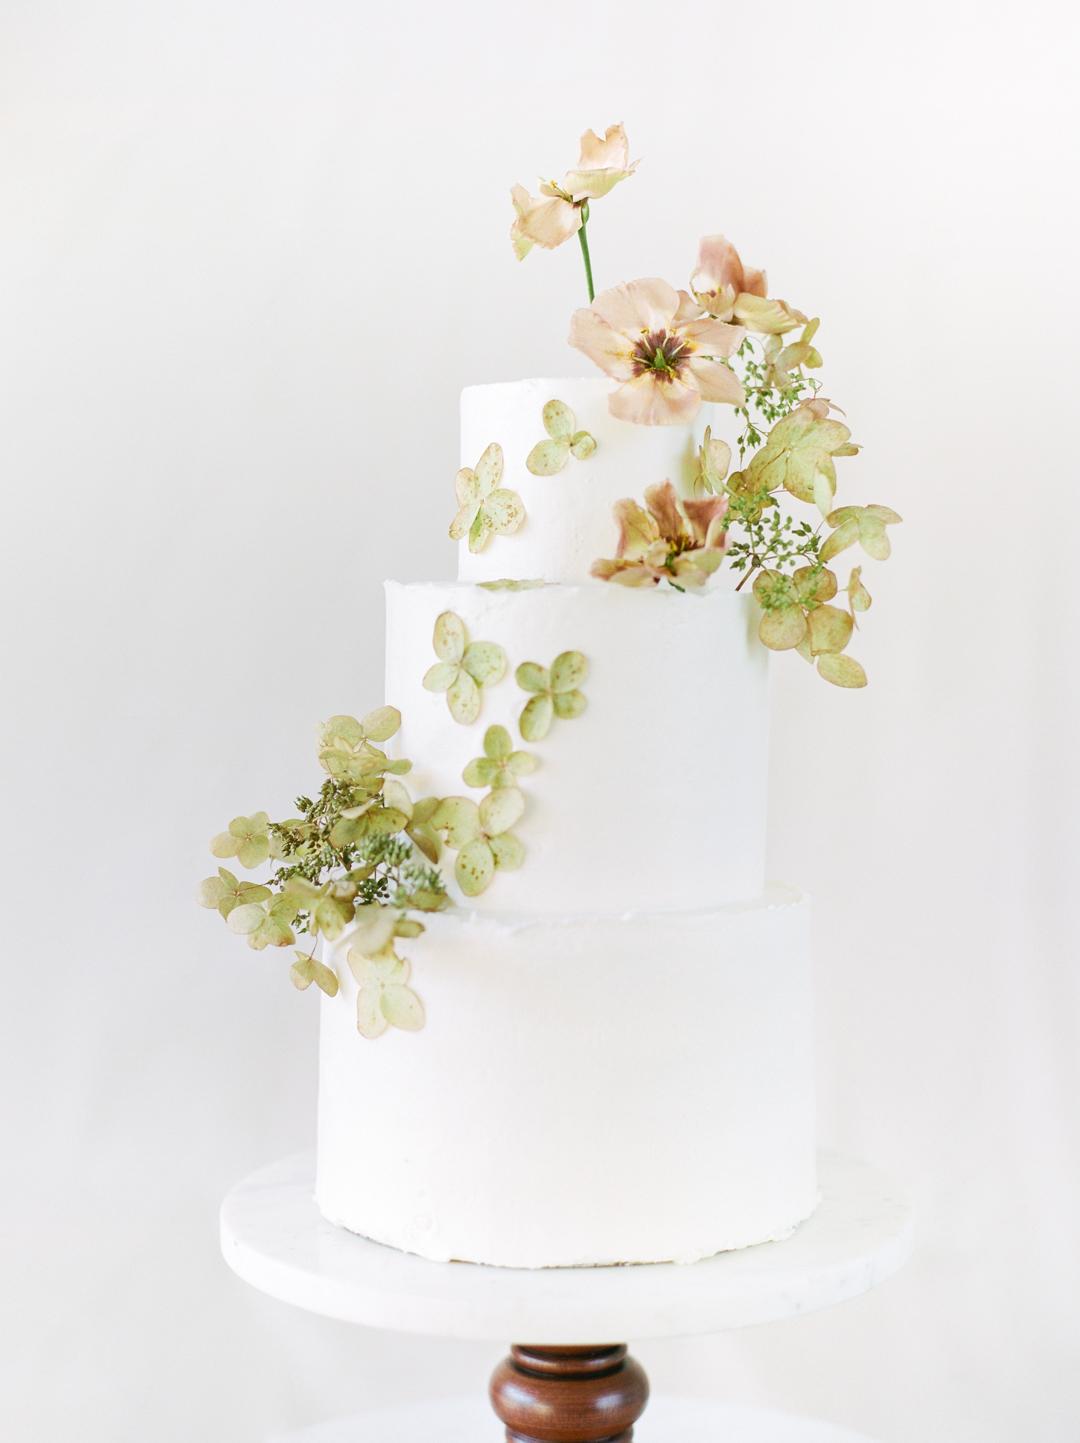 Green Hydrangea Dried Flower Wedding Cake